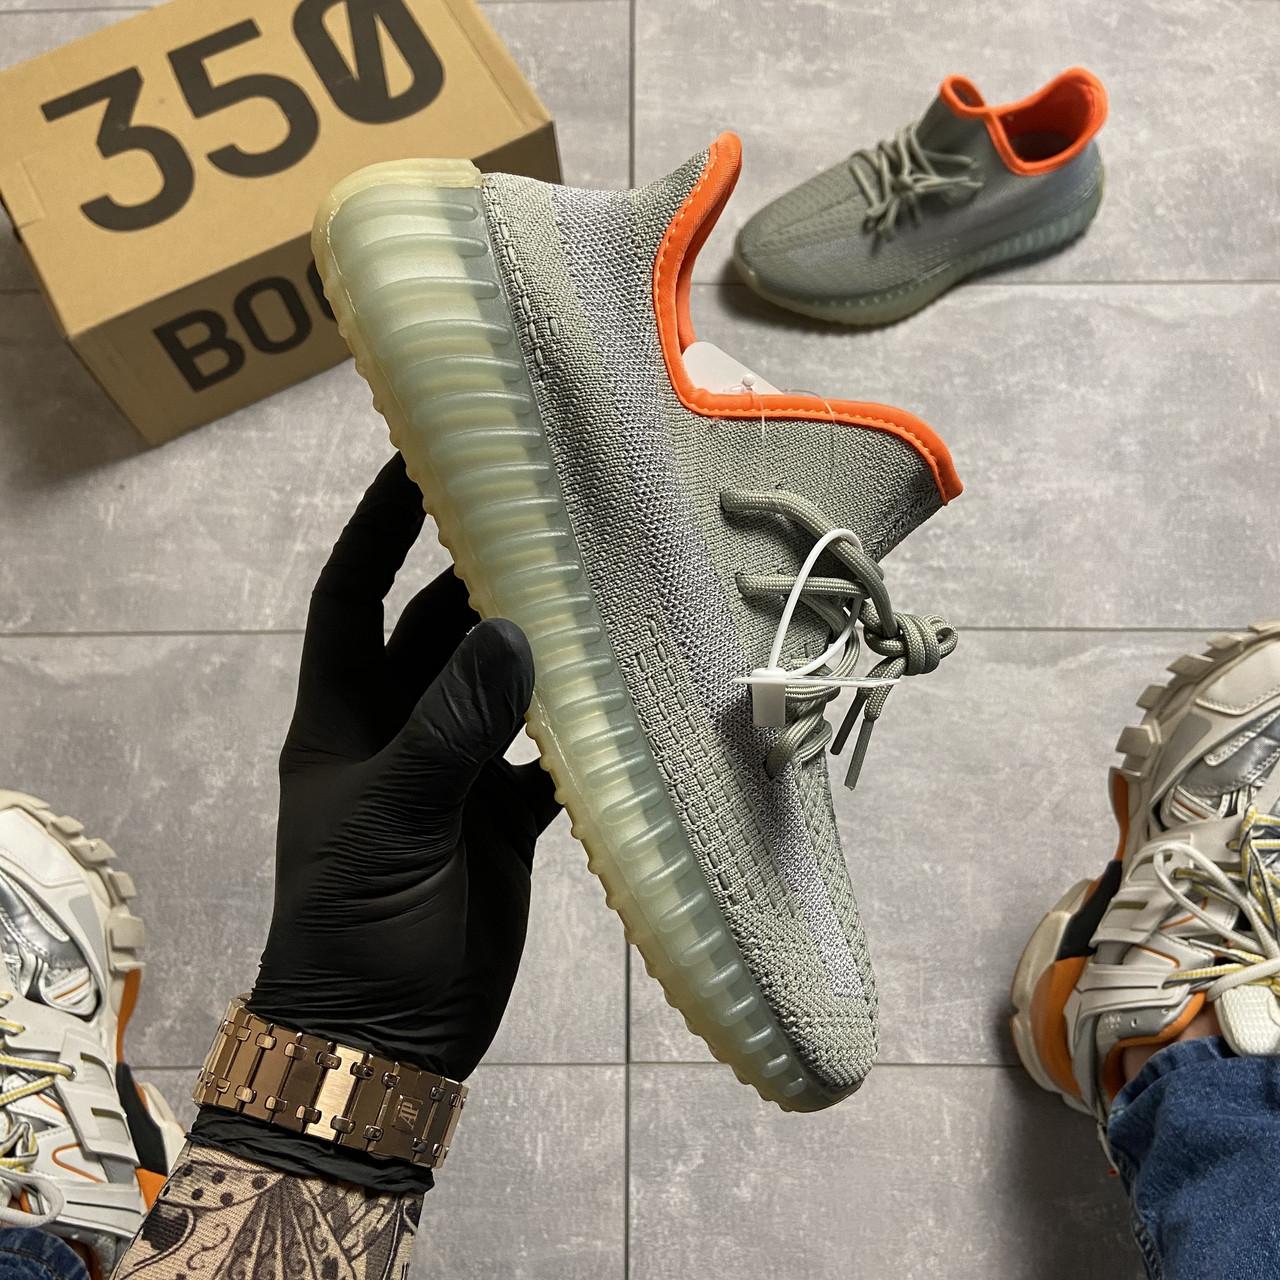 Adidas Yeezy Boost 350 V2 Desert Sage (Серый)